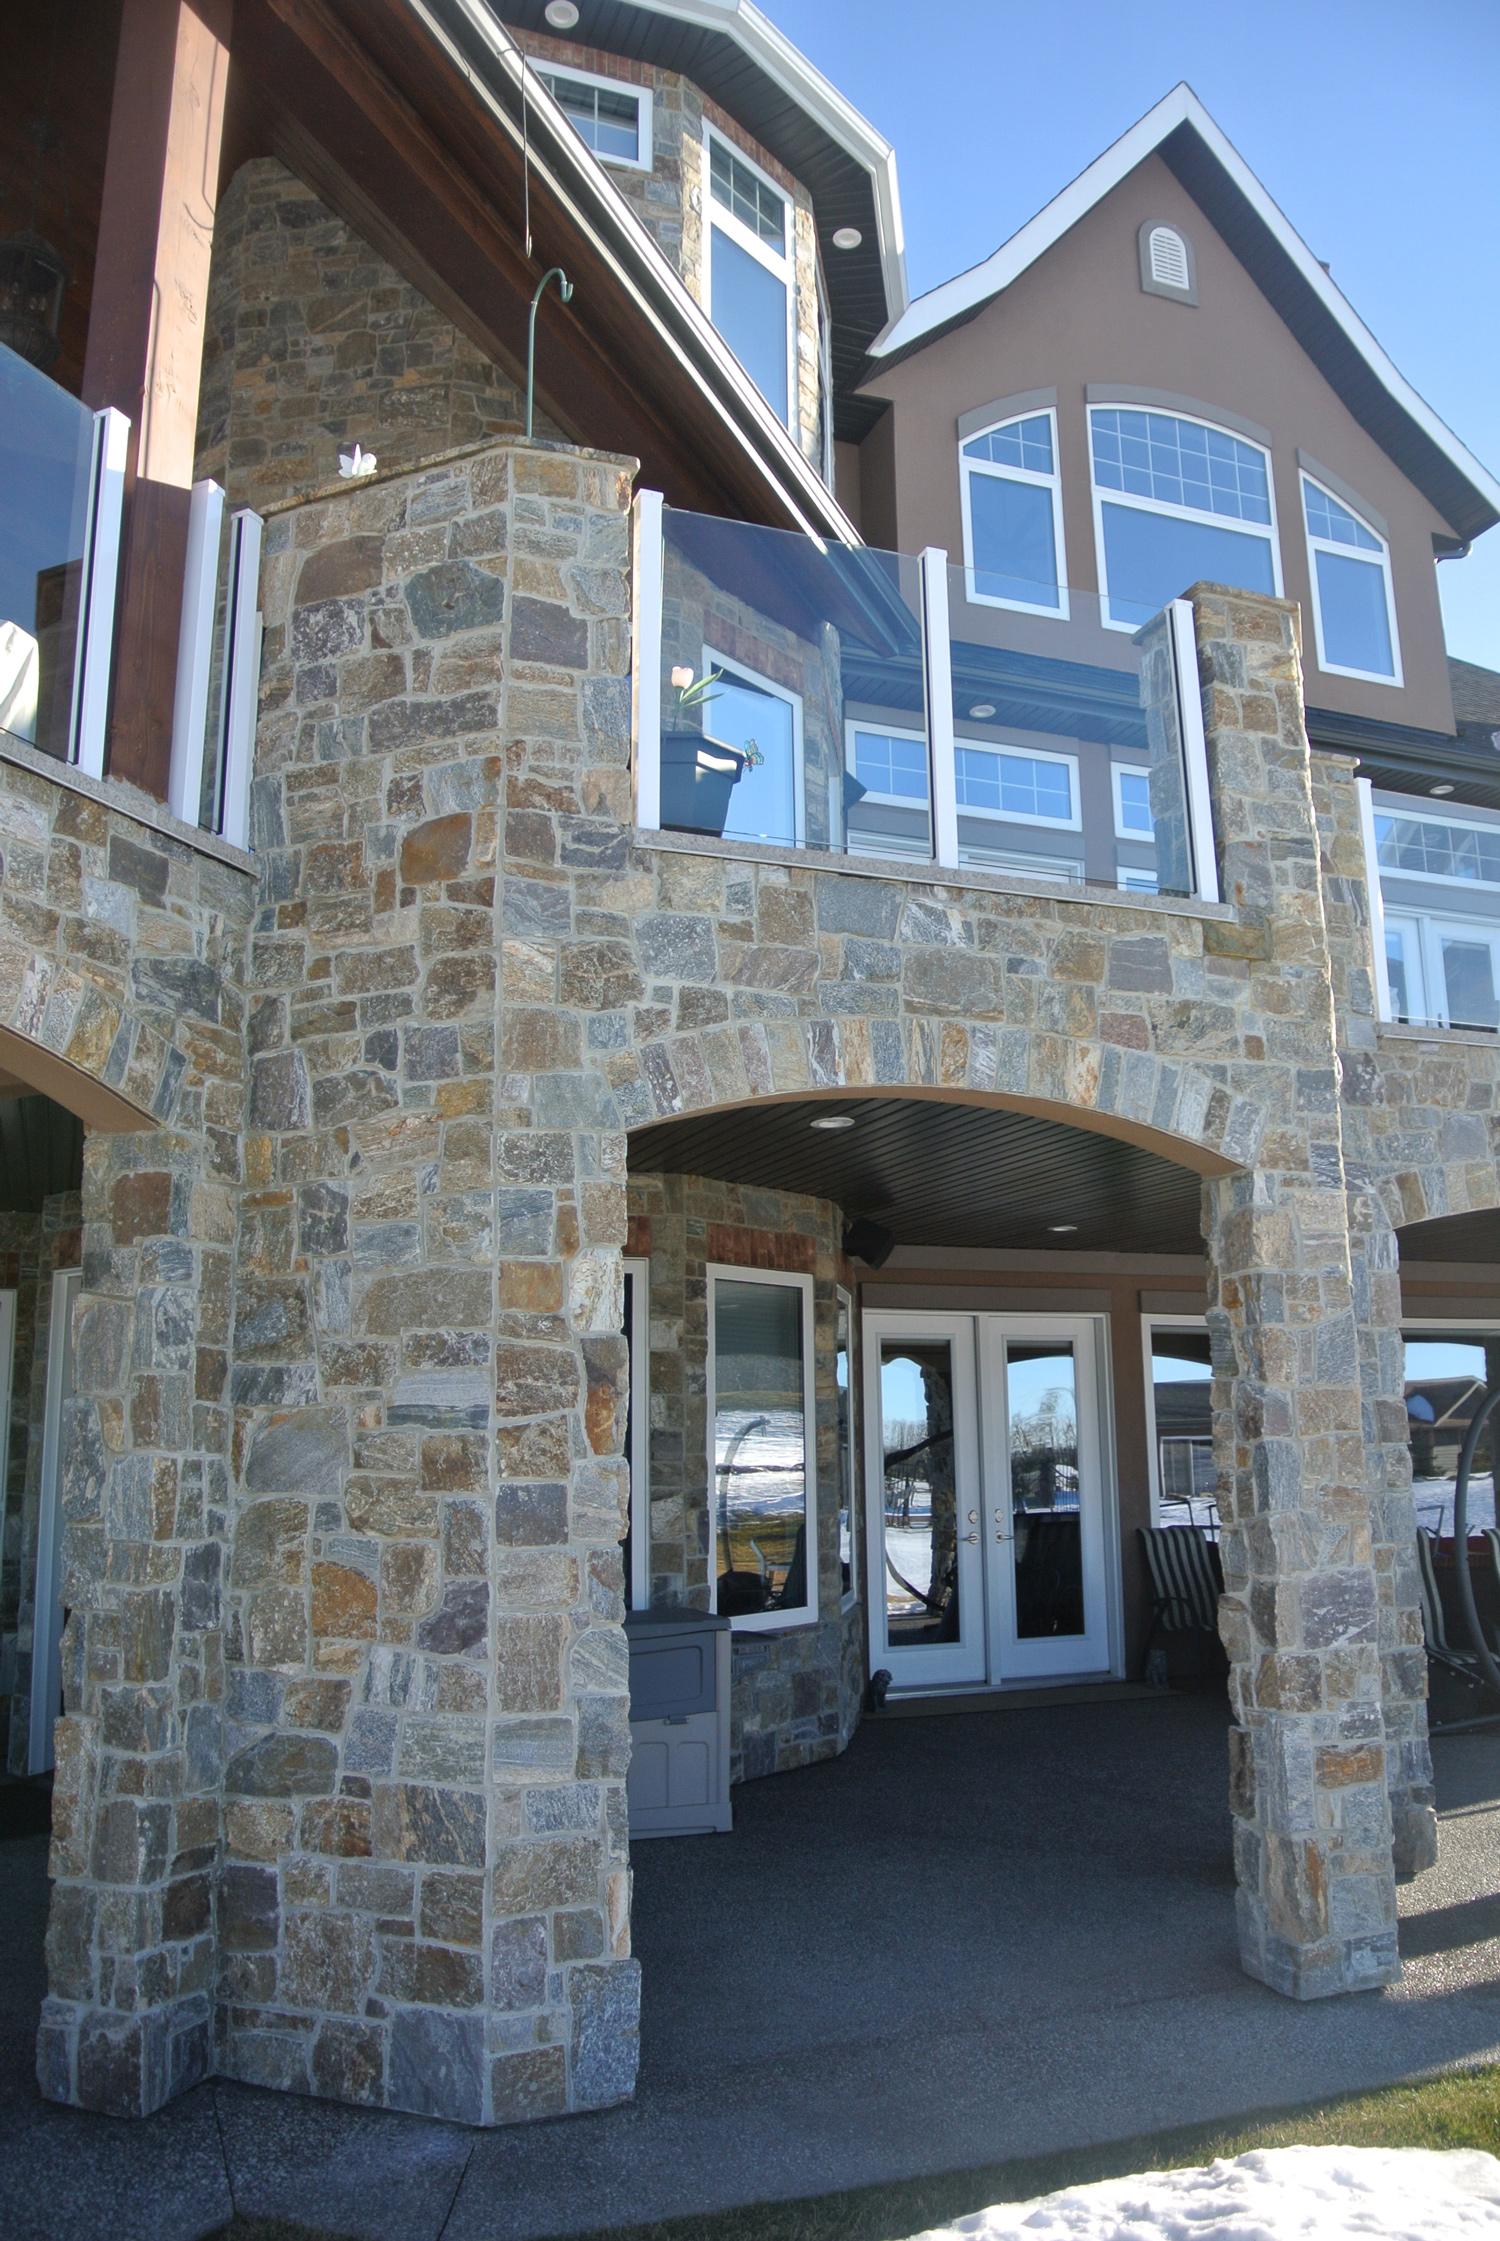 Pacific Northwest Stone - Kettle Valley Granite